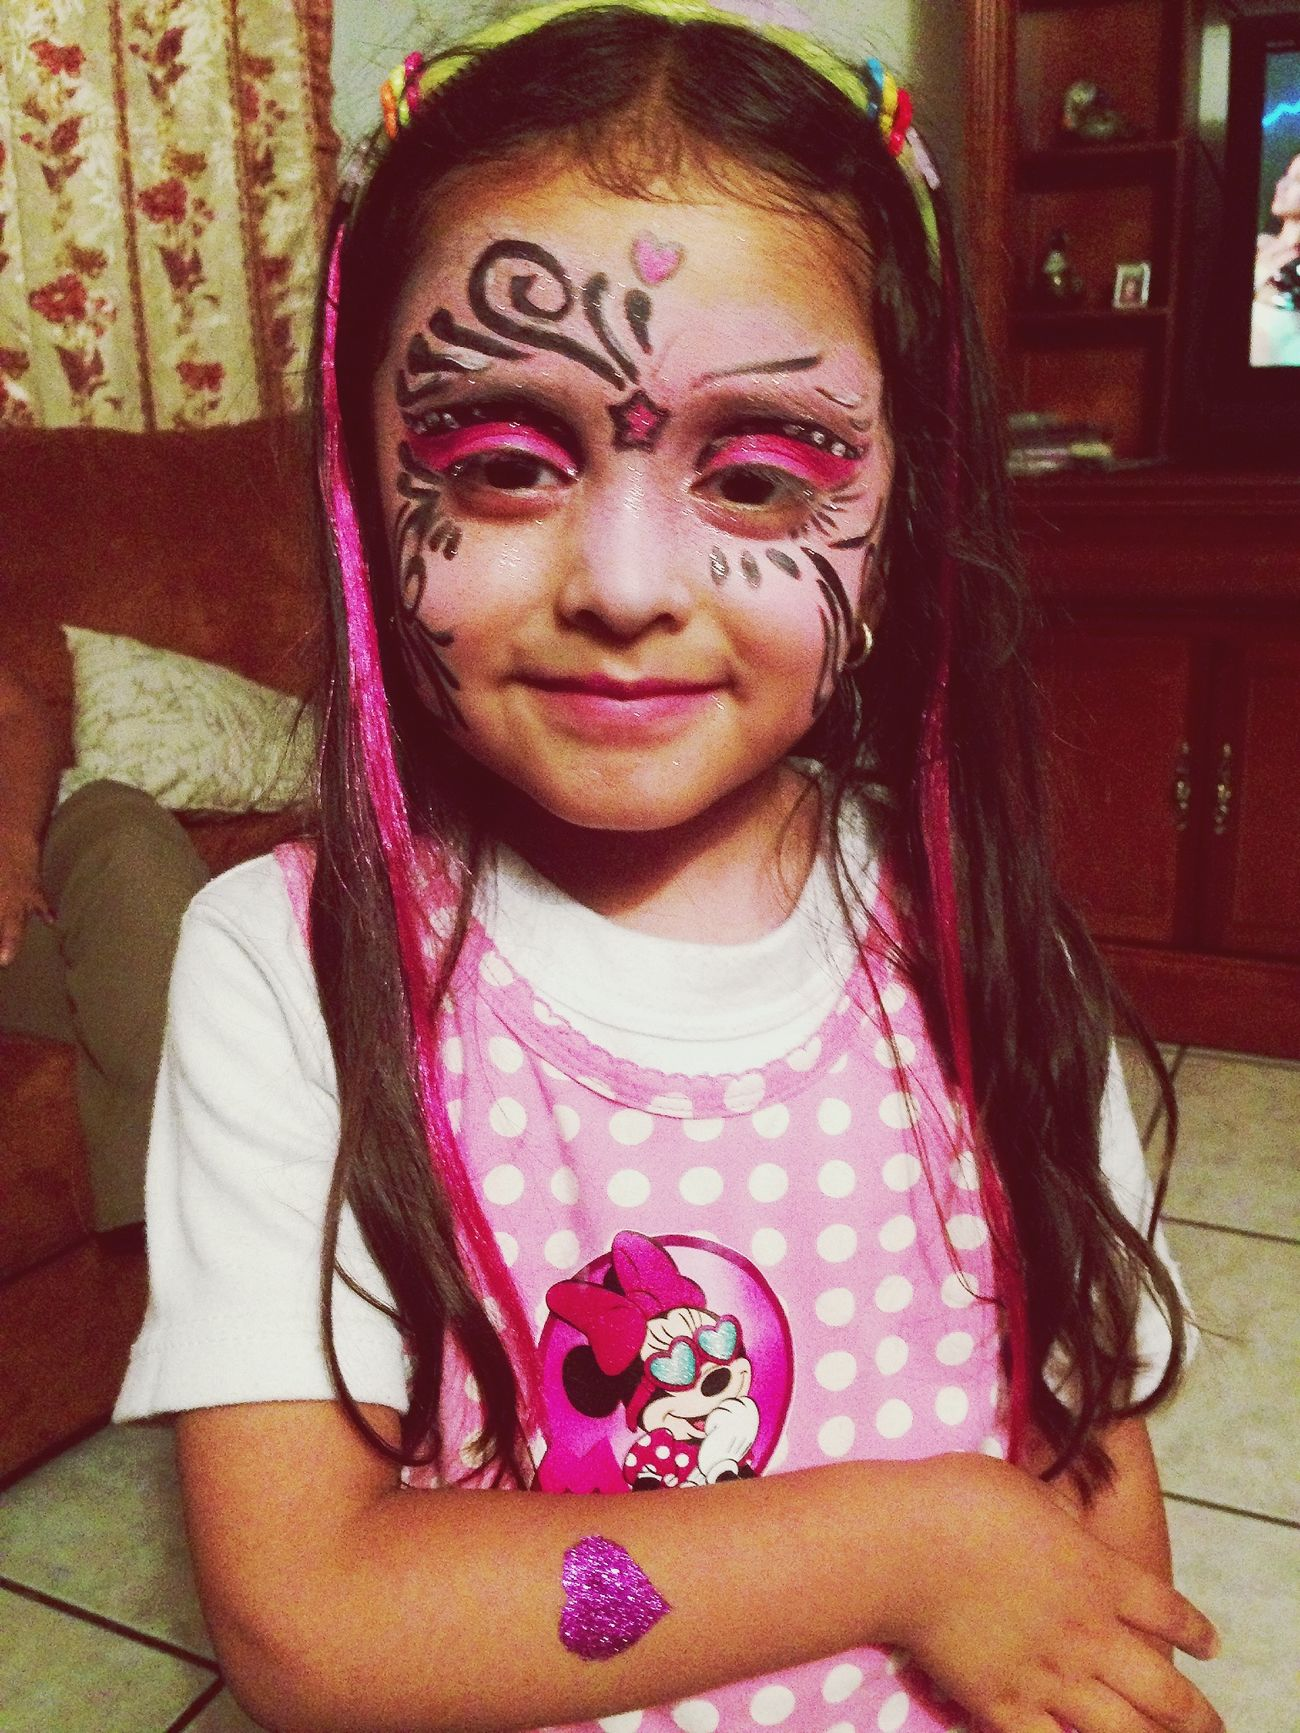 mi hermosa sobrina! yo la pinte en mi trabajo! Recorcholis!  :3